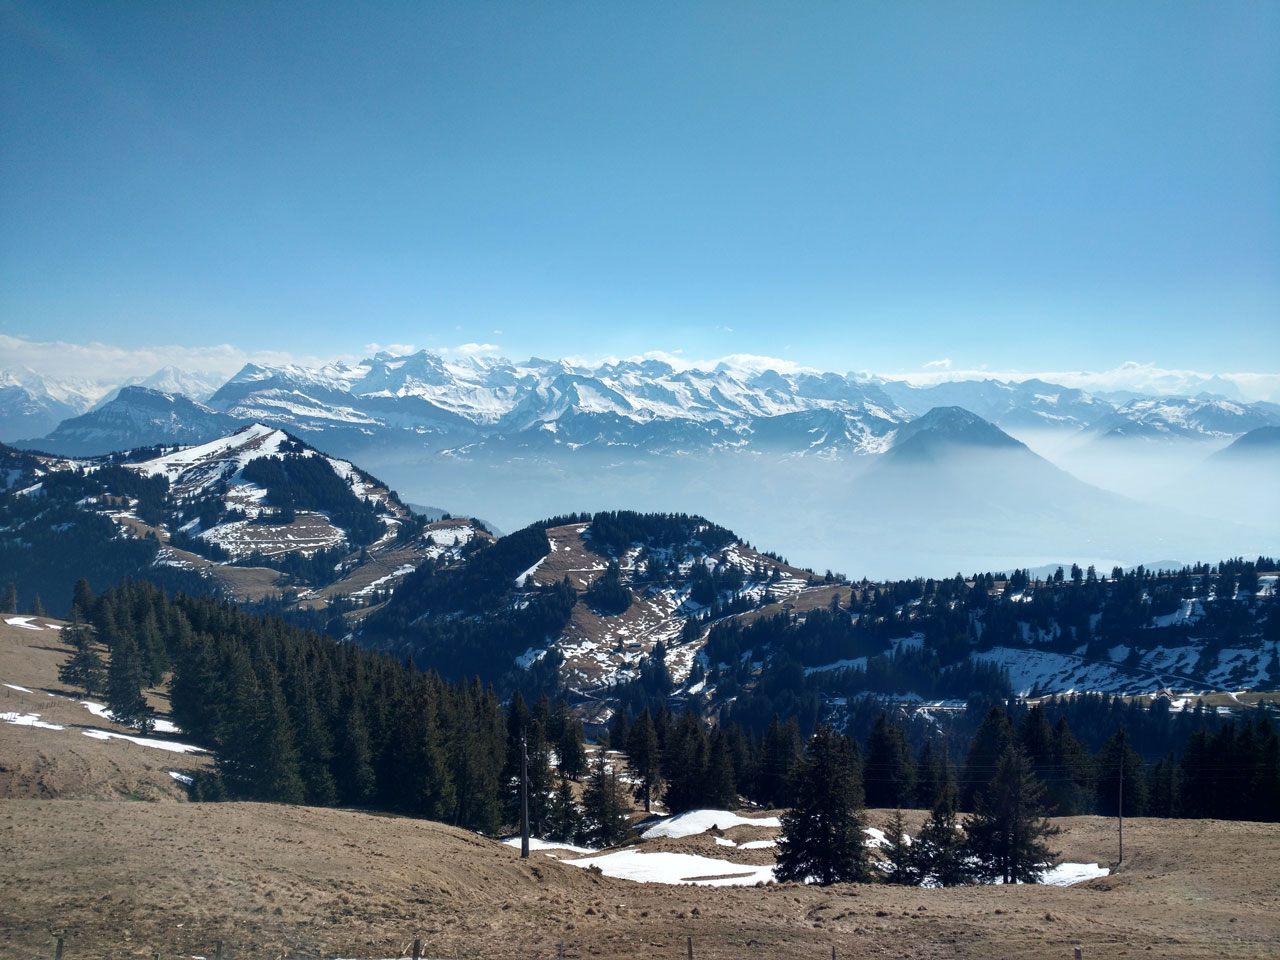 Mount Rigi hiking